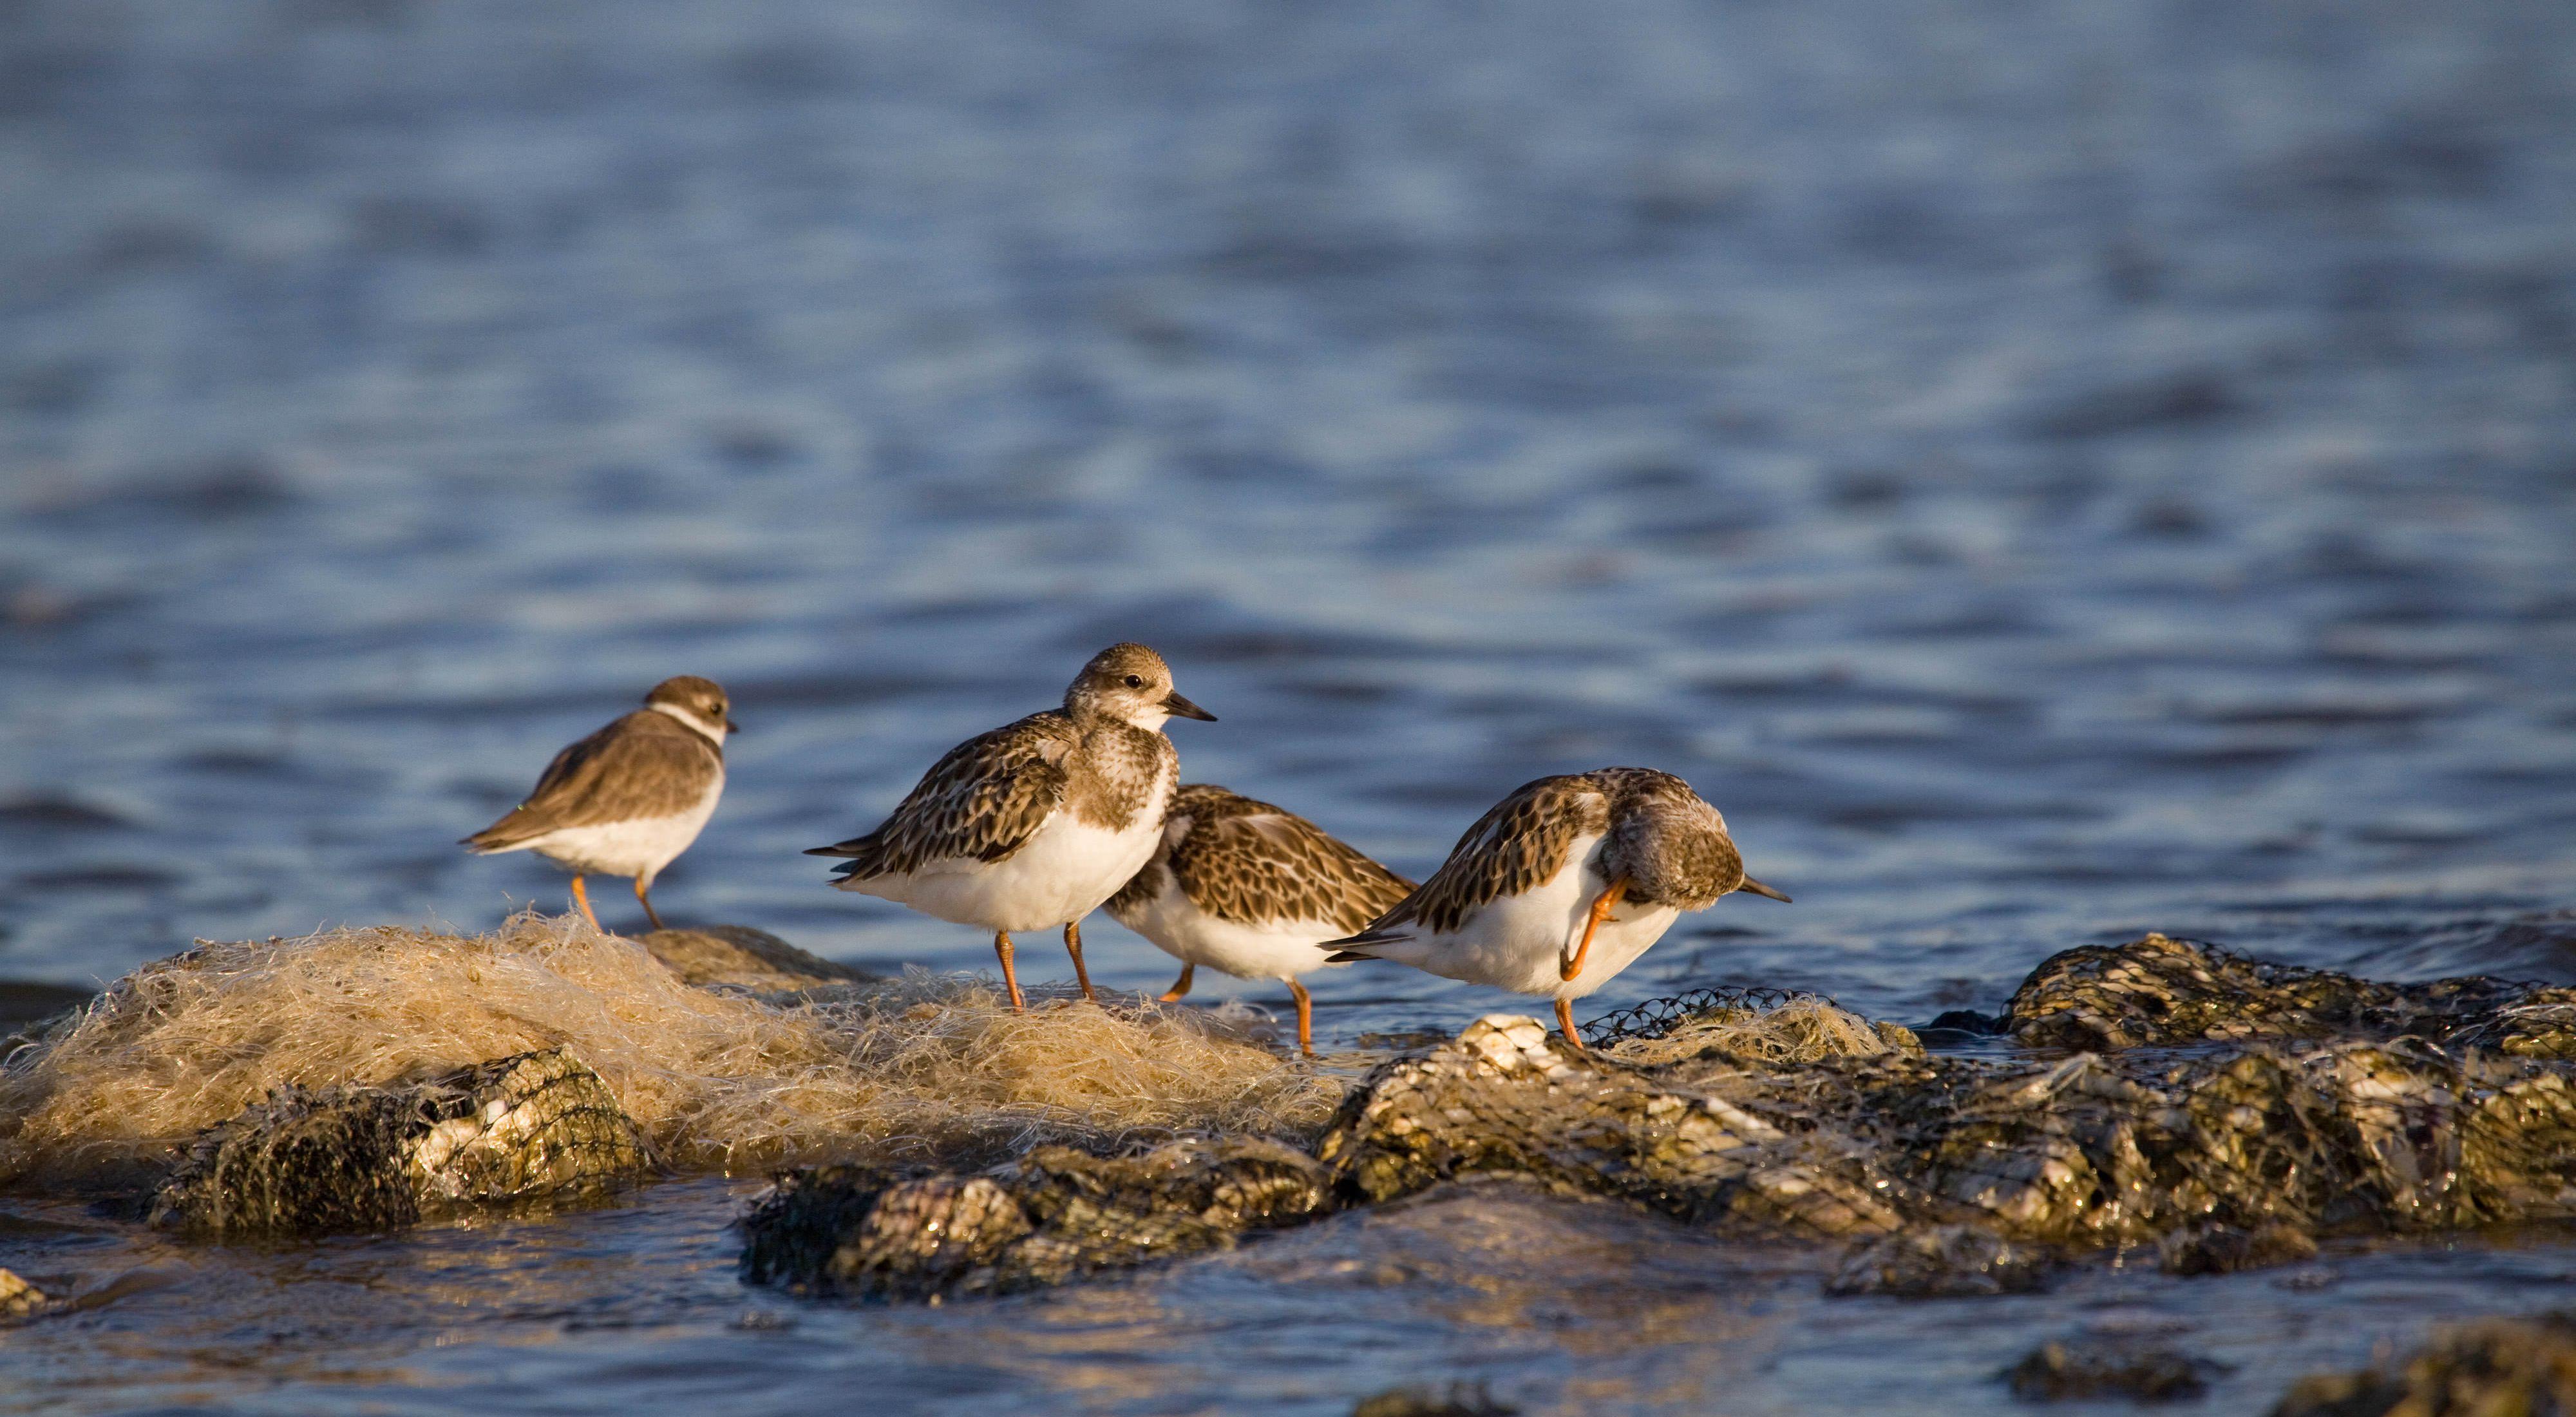 Sanderlings (Calidris alba) use oyster reefs for foraging at Alabama Port.